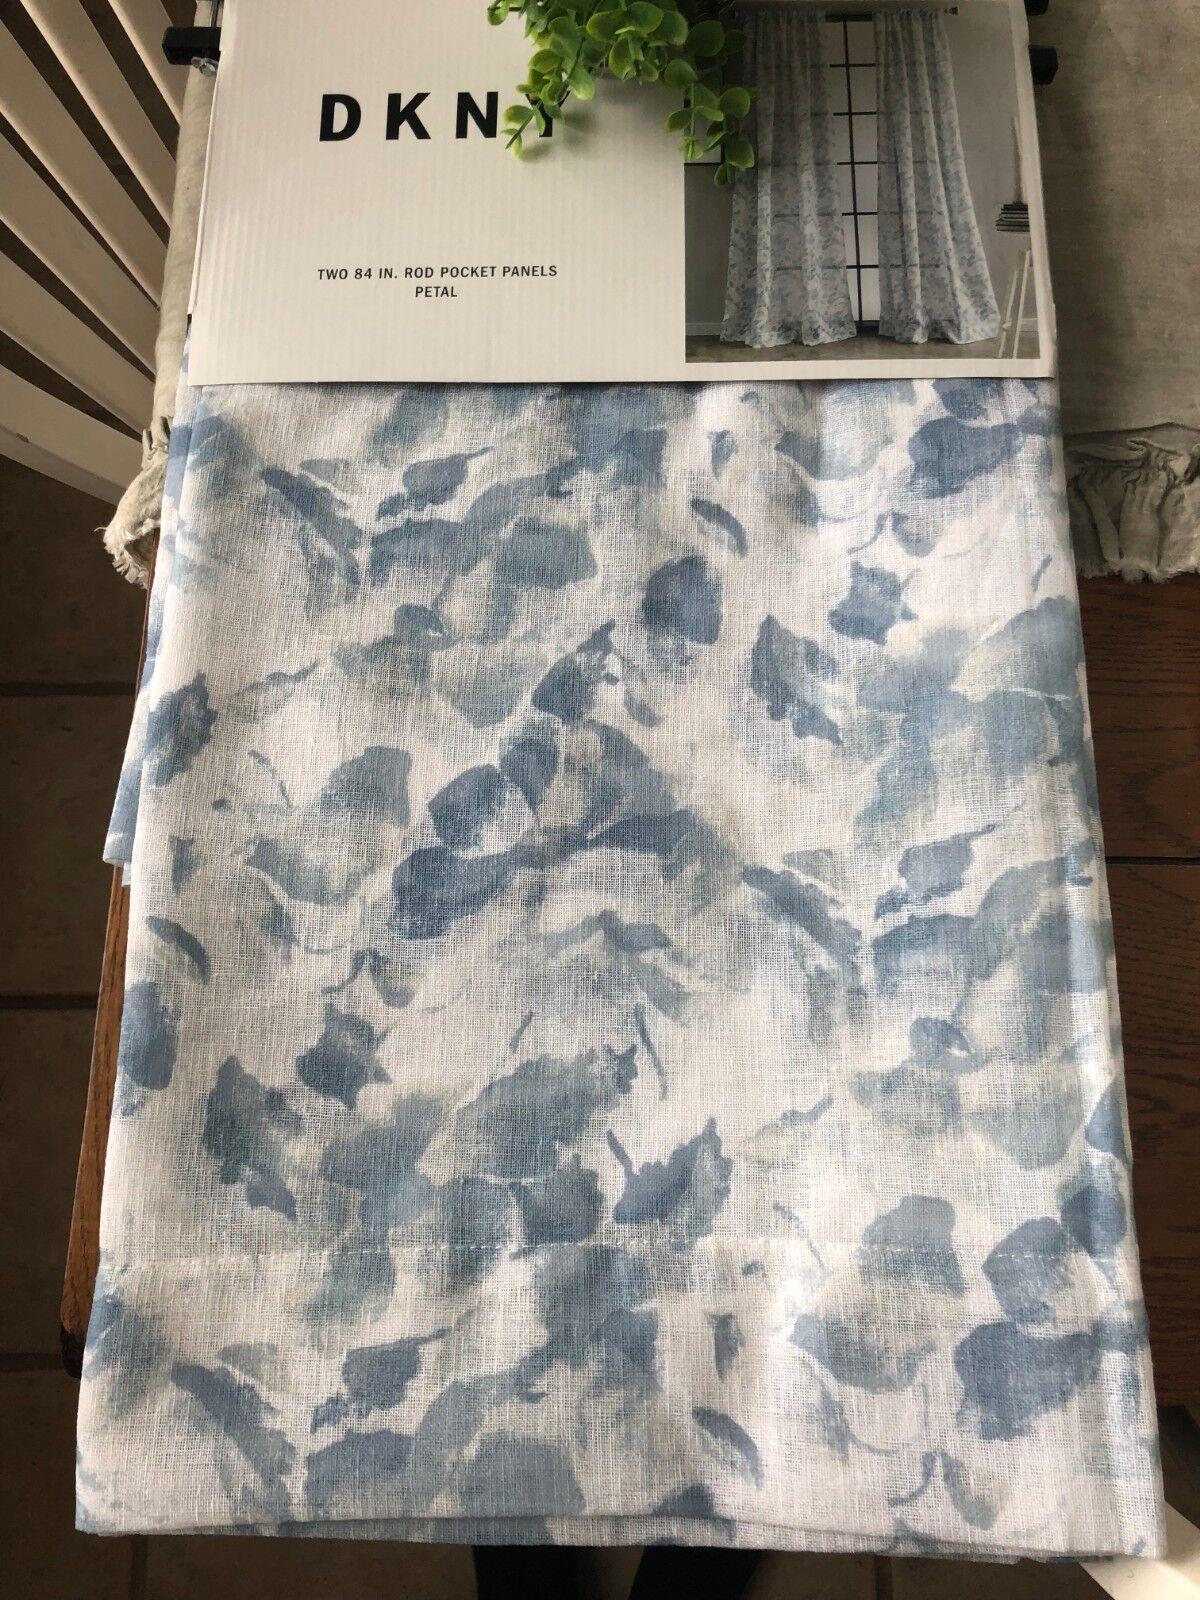 NEW DKNY  PETAL FLORAL   Window Curtains 2 50  x 84   PANELS BlauS